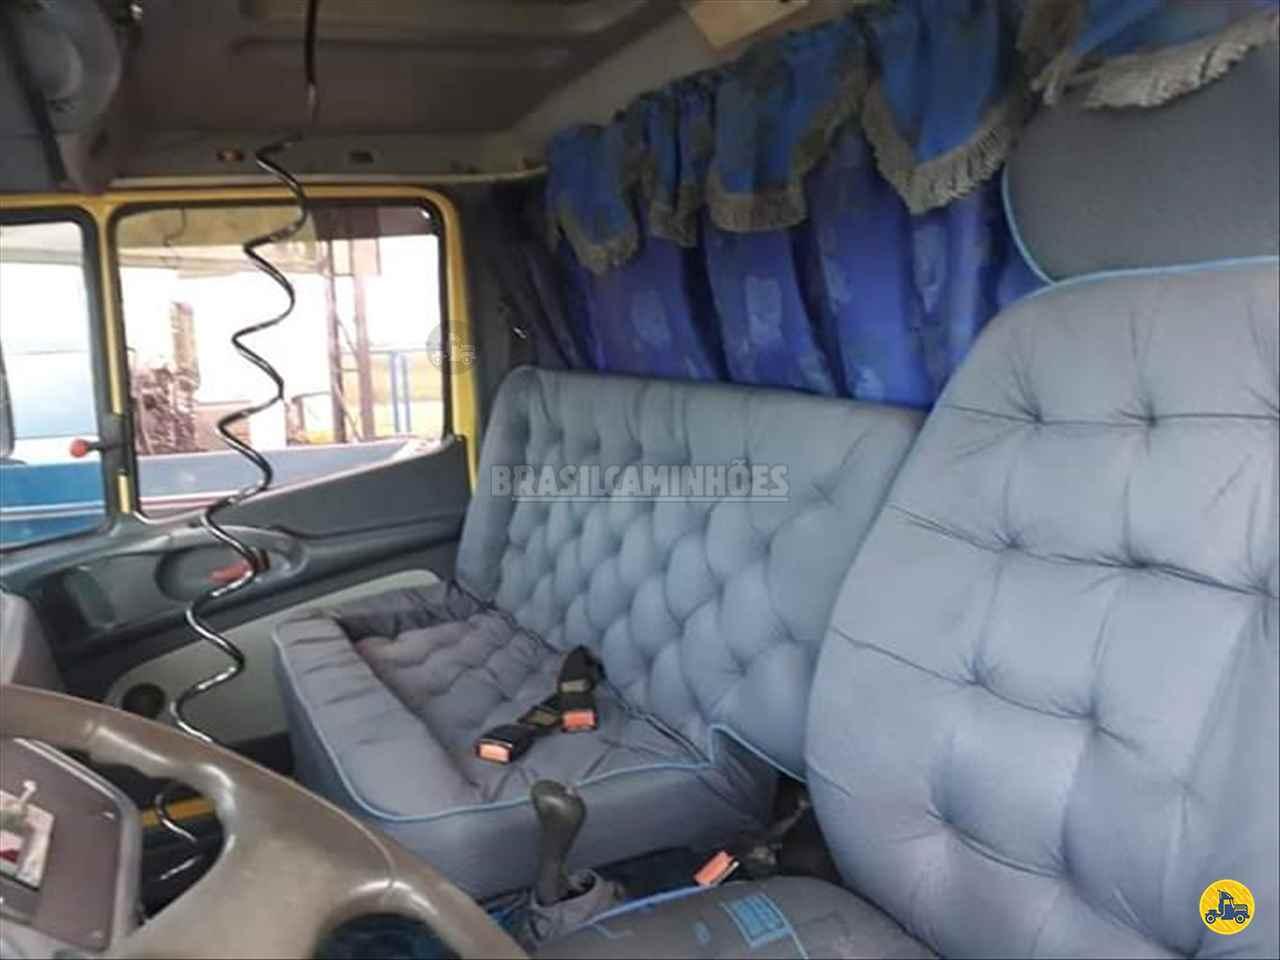 MERCEDES-BENZ MB 712 319000km 1998/1998 Brasil Caminhões Sinop